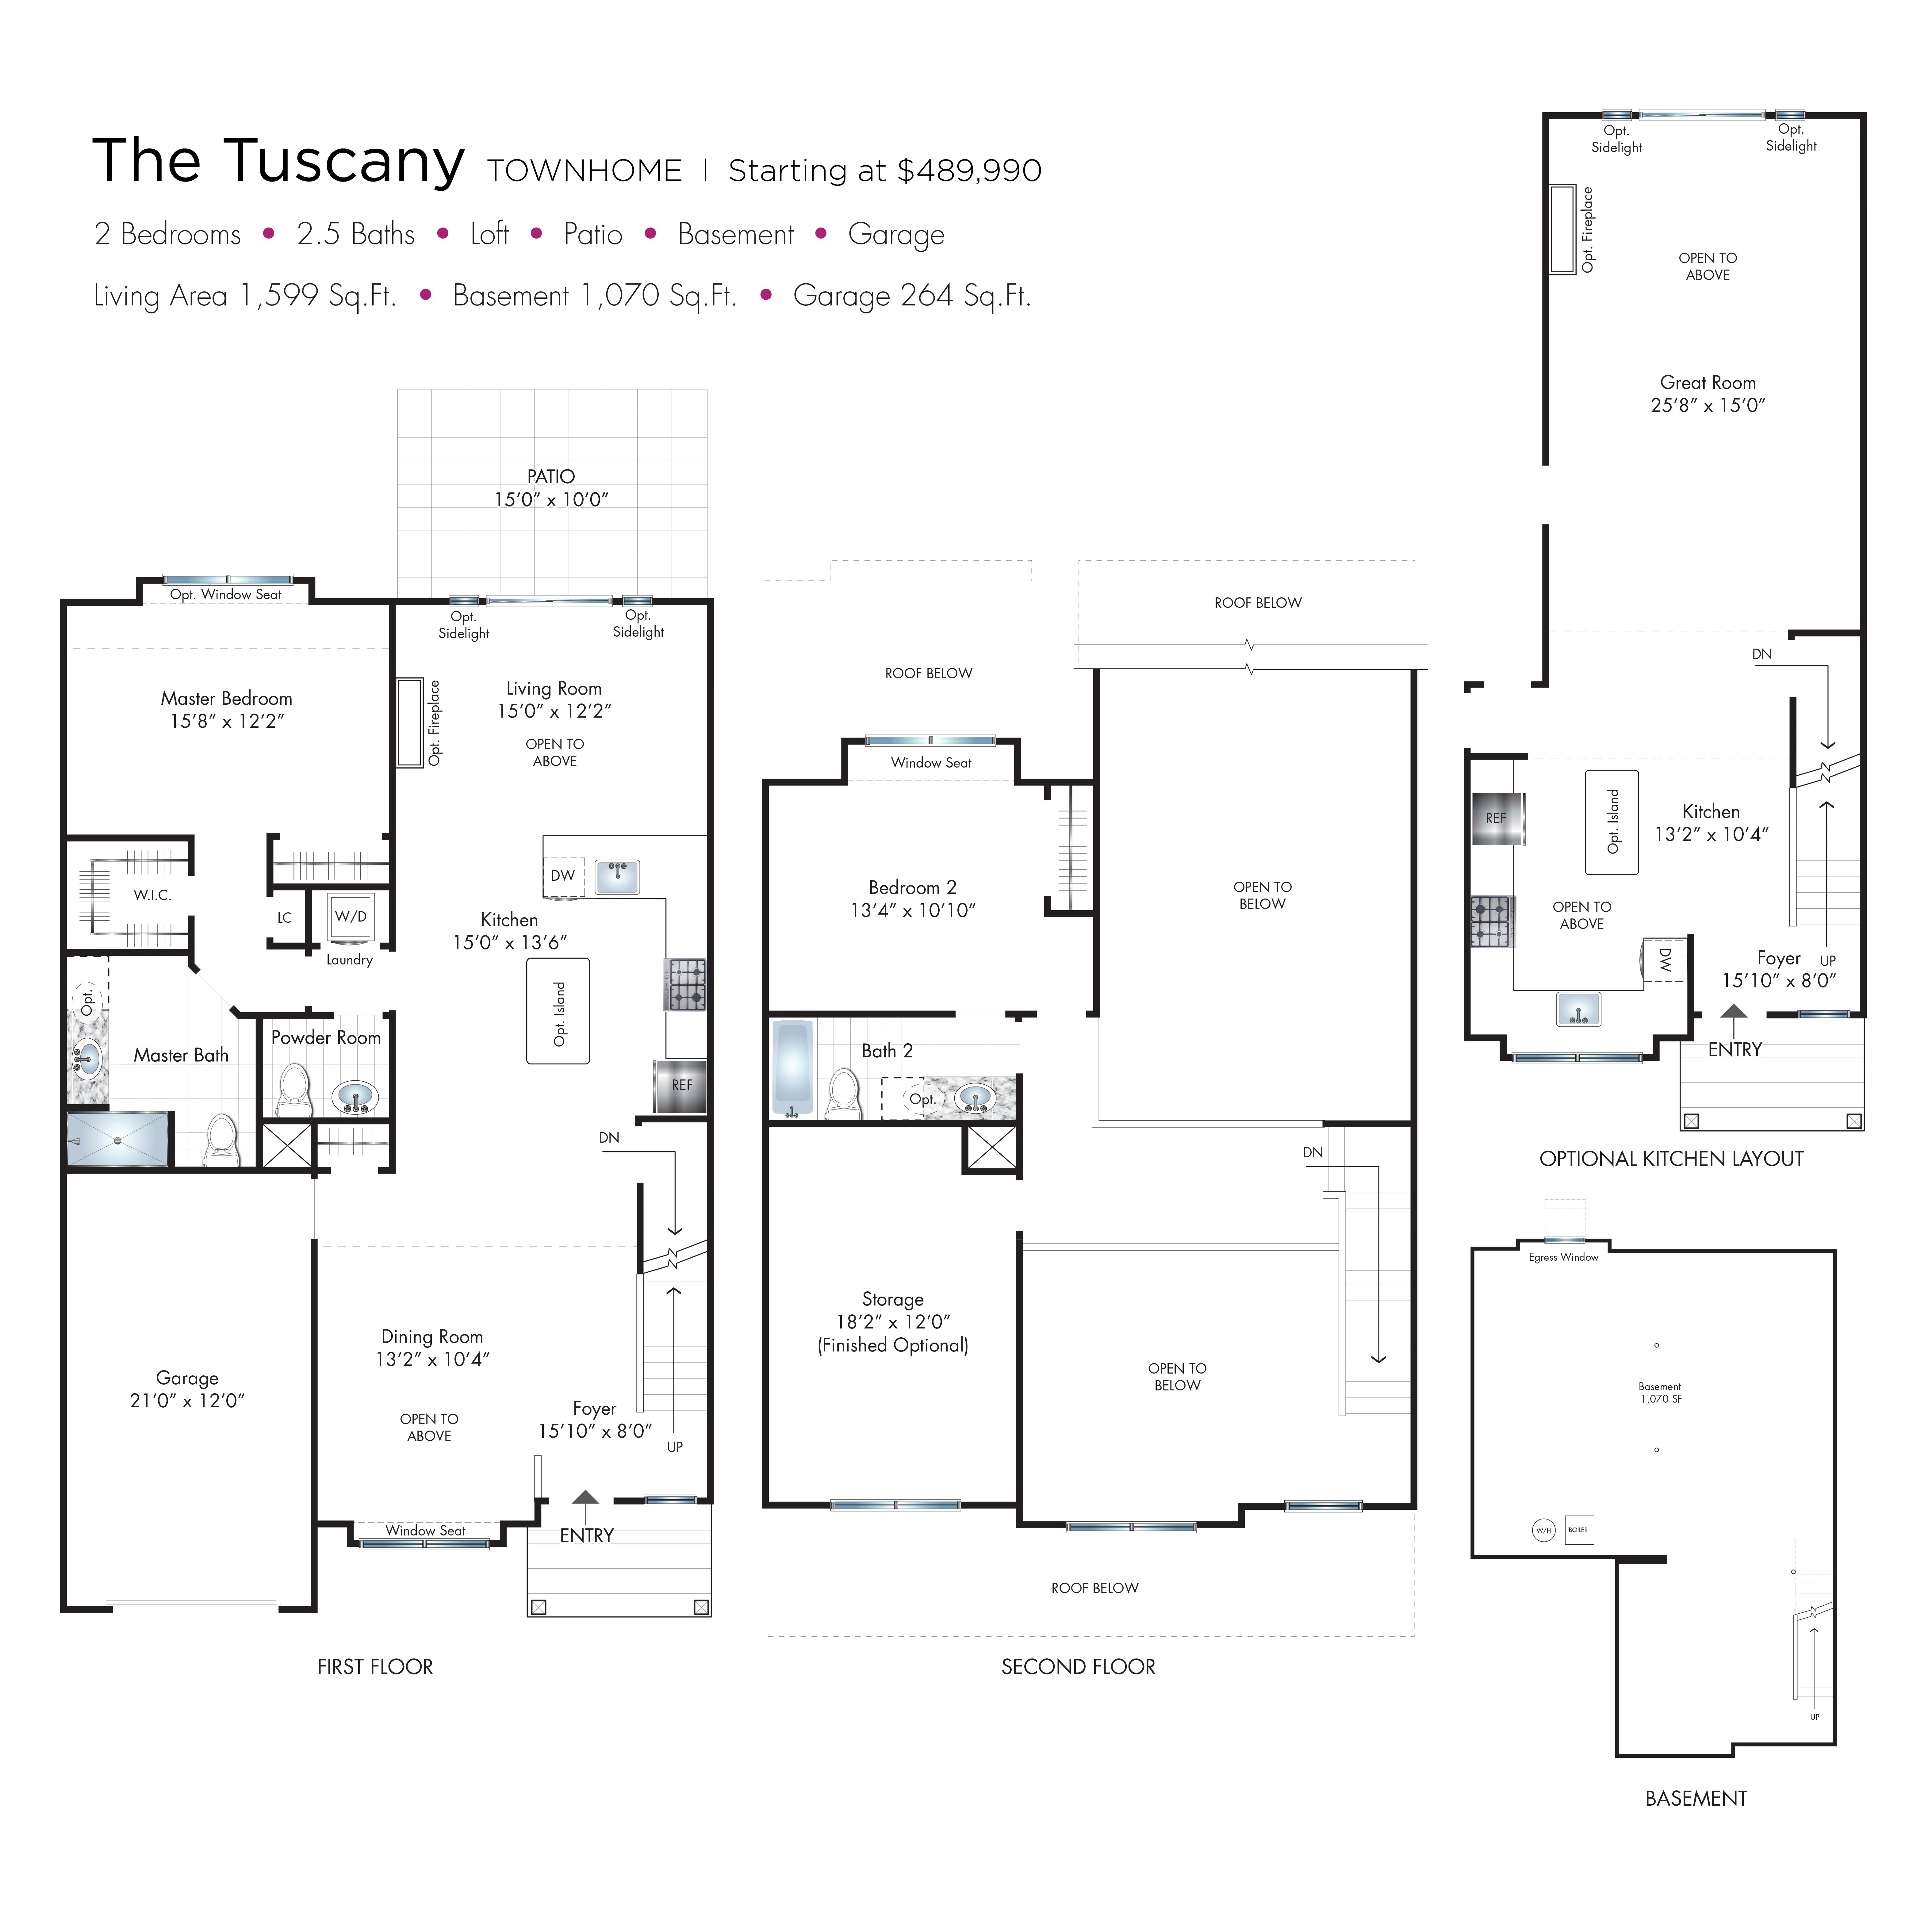 Tuscany Townhome Floor Plan